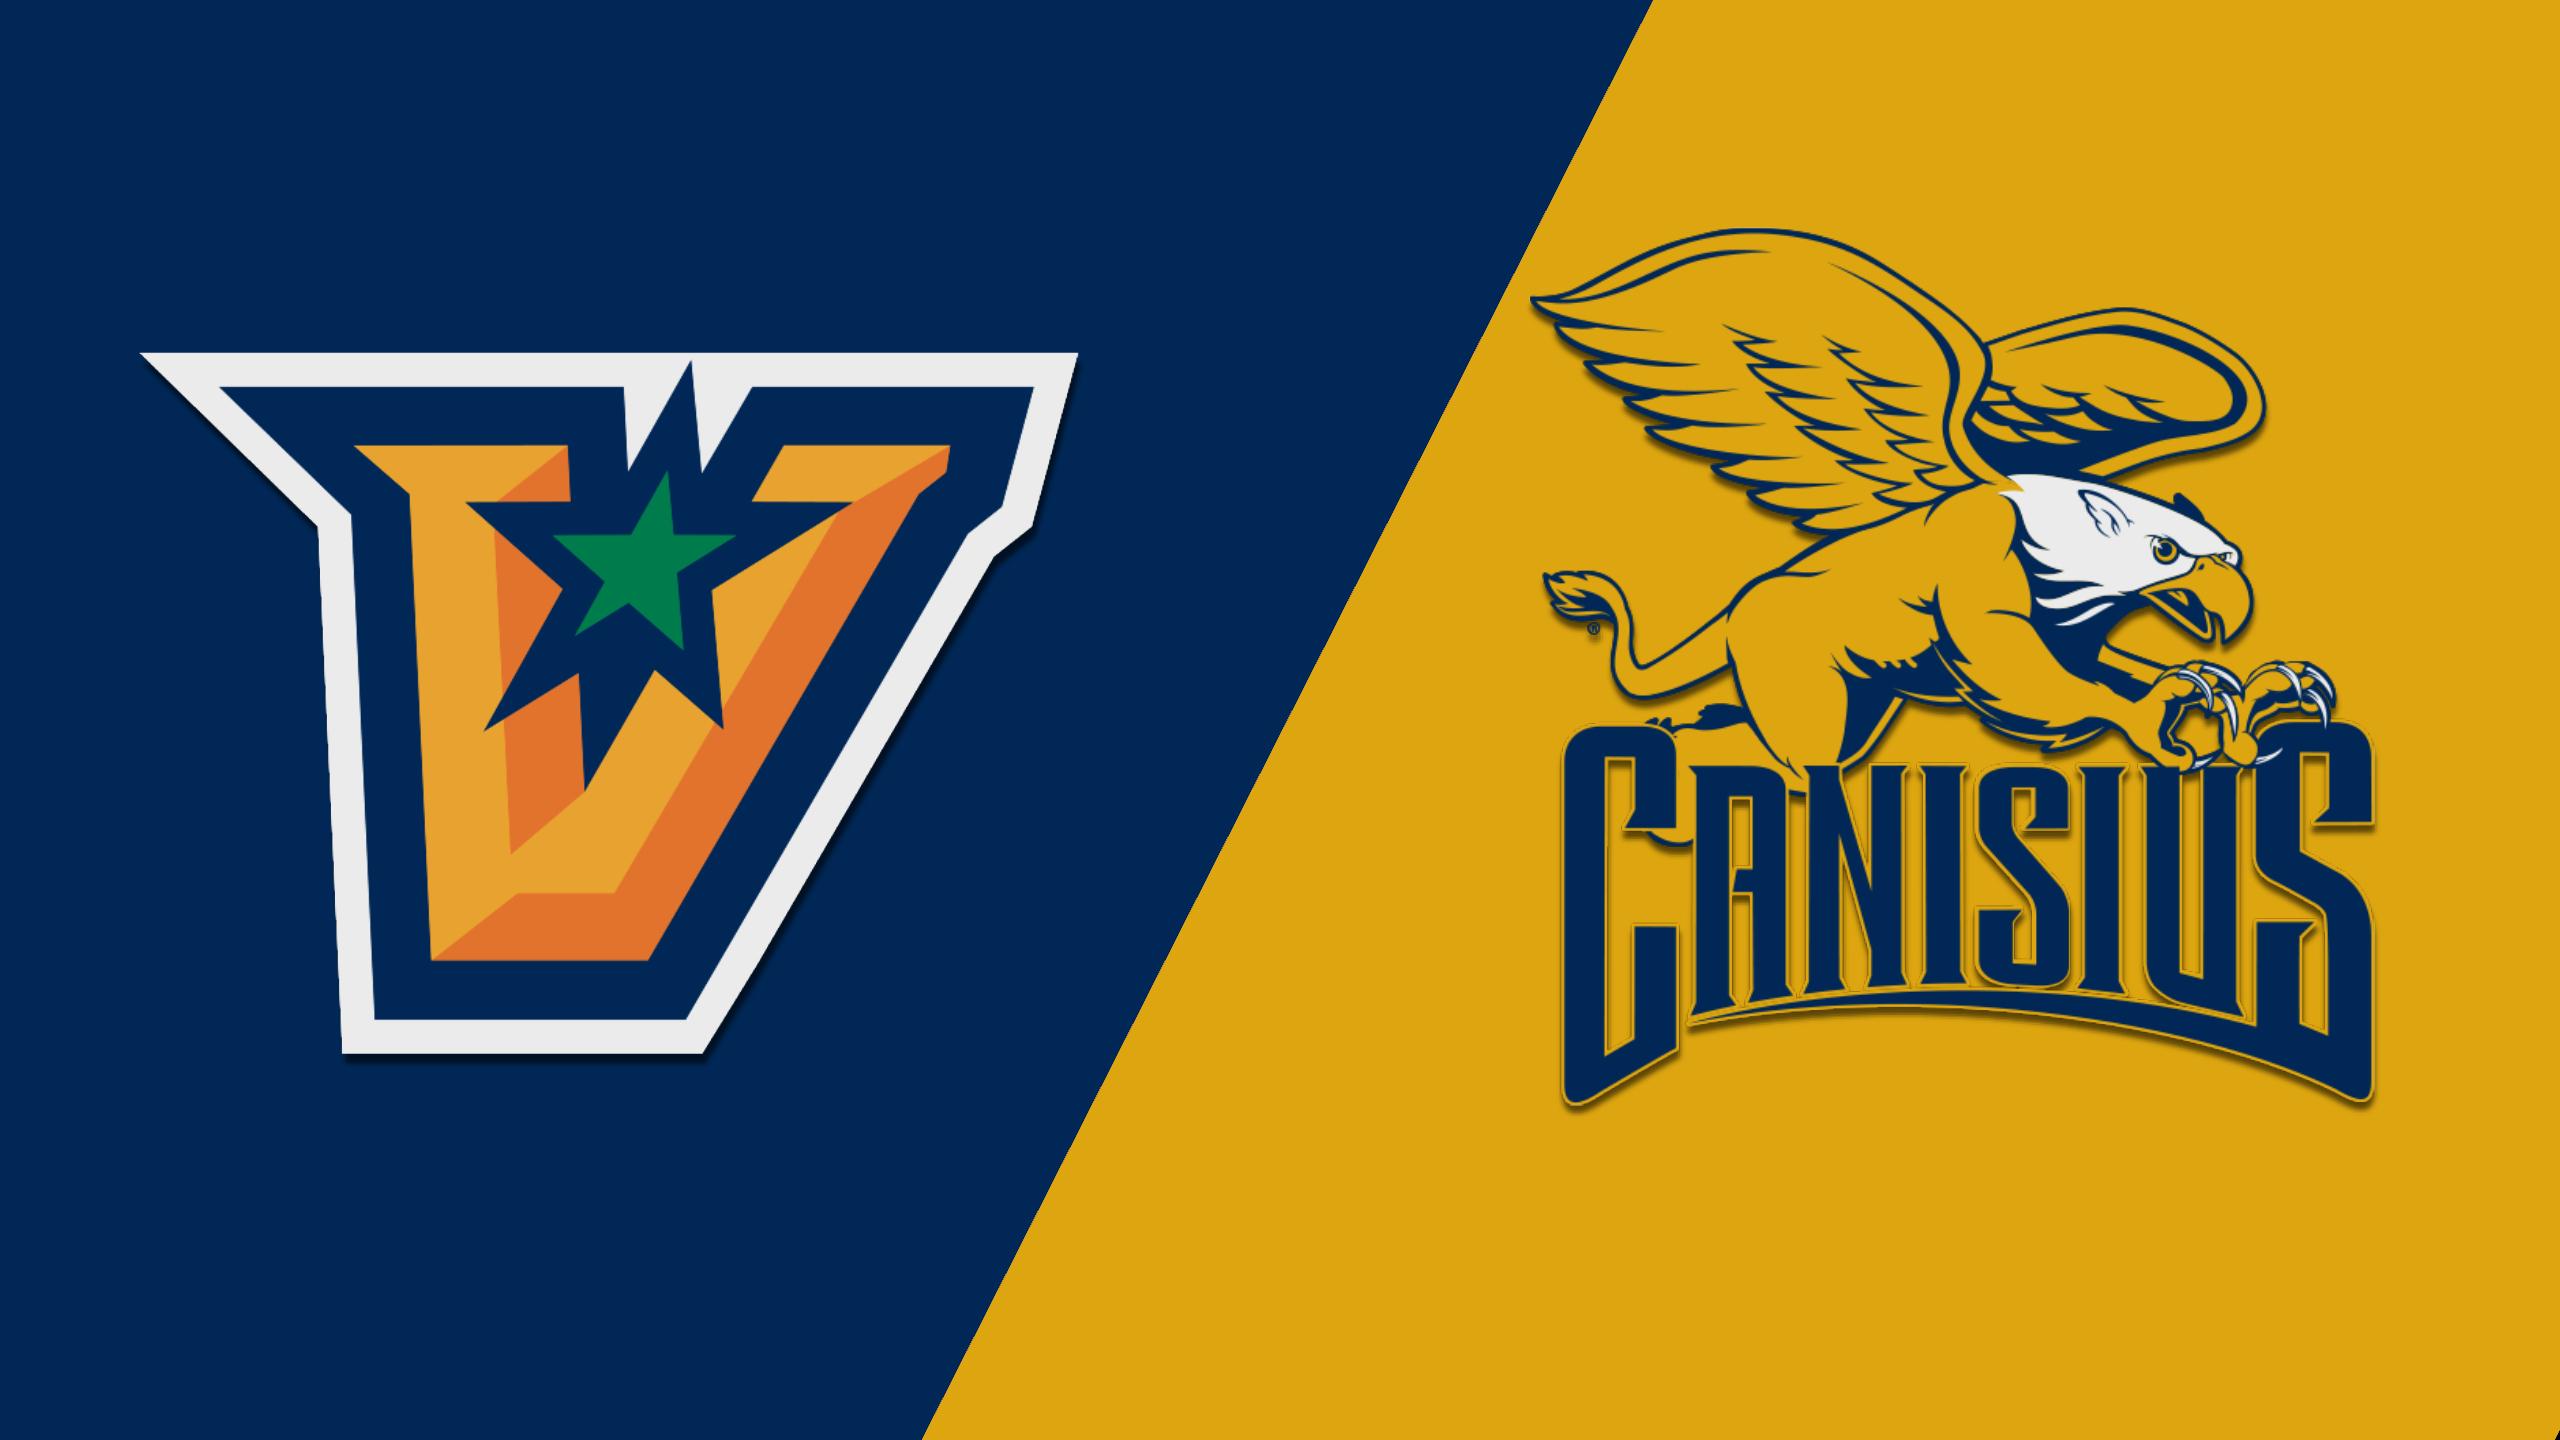 UT Rio Grande Valley vs. Canisius (W Basketball)